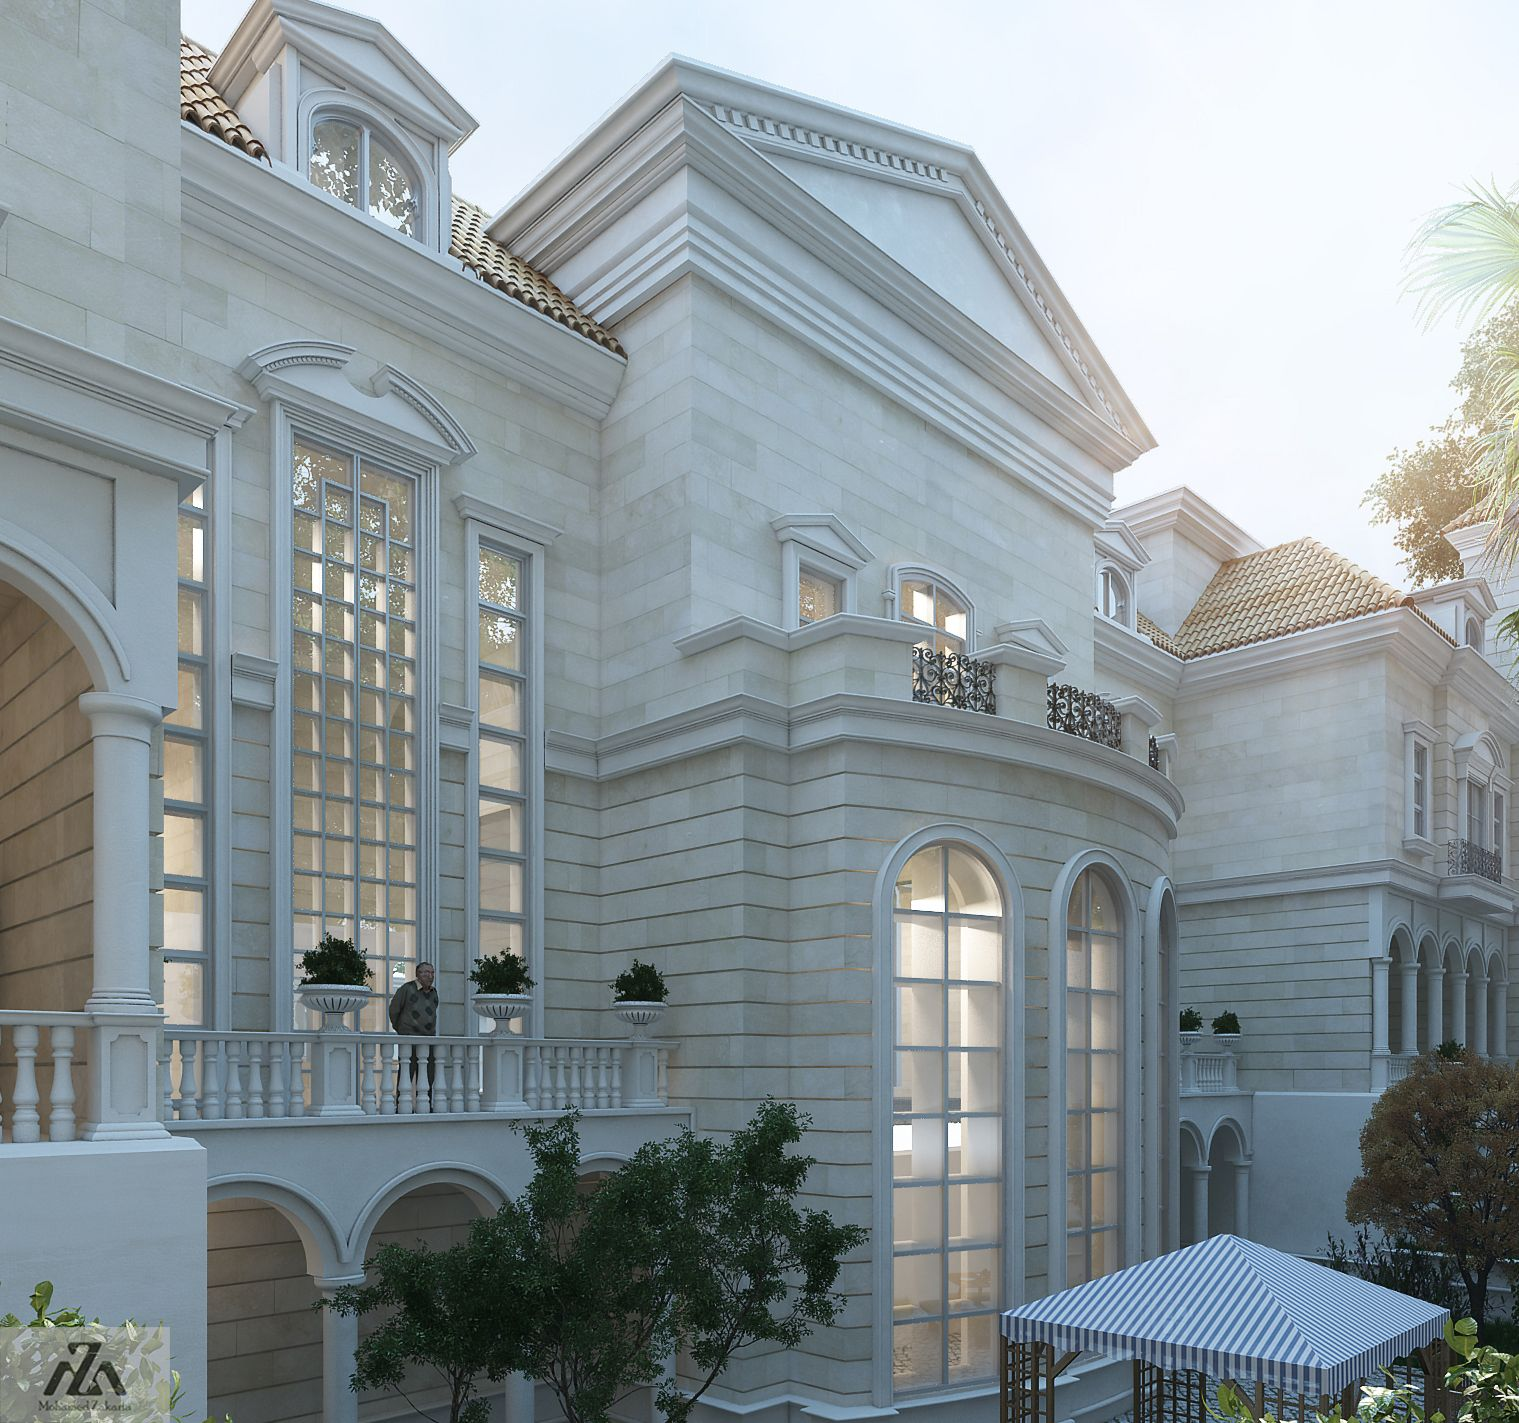 Quality Home Exteriors Design: Big Palace ProjectLocation Riyadh Saudi Arabia